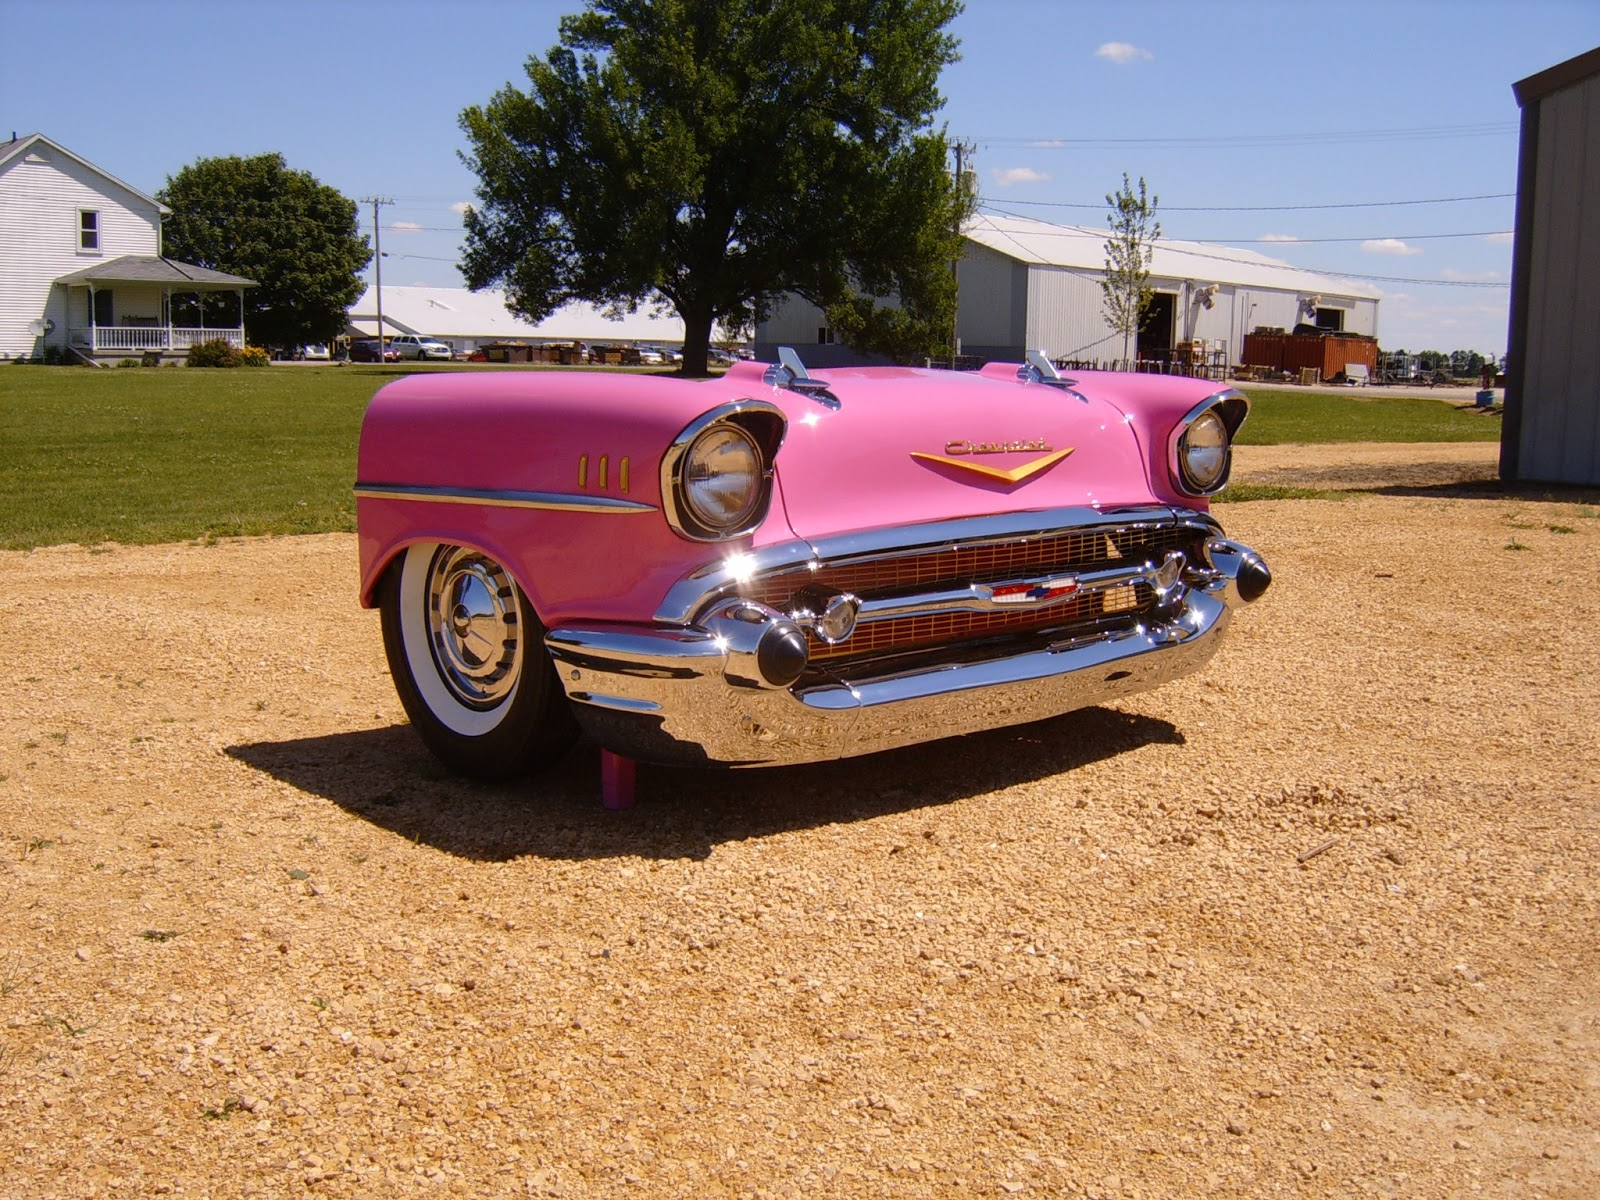 Car Desks Exhaust Pipe Dreams Car Cut Creations Pt2 Car Desks Continued